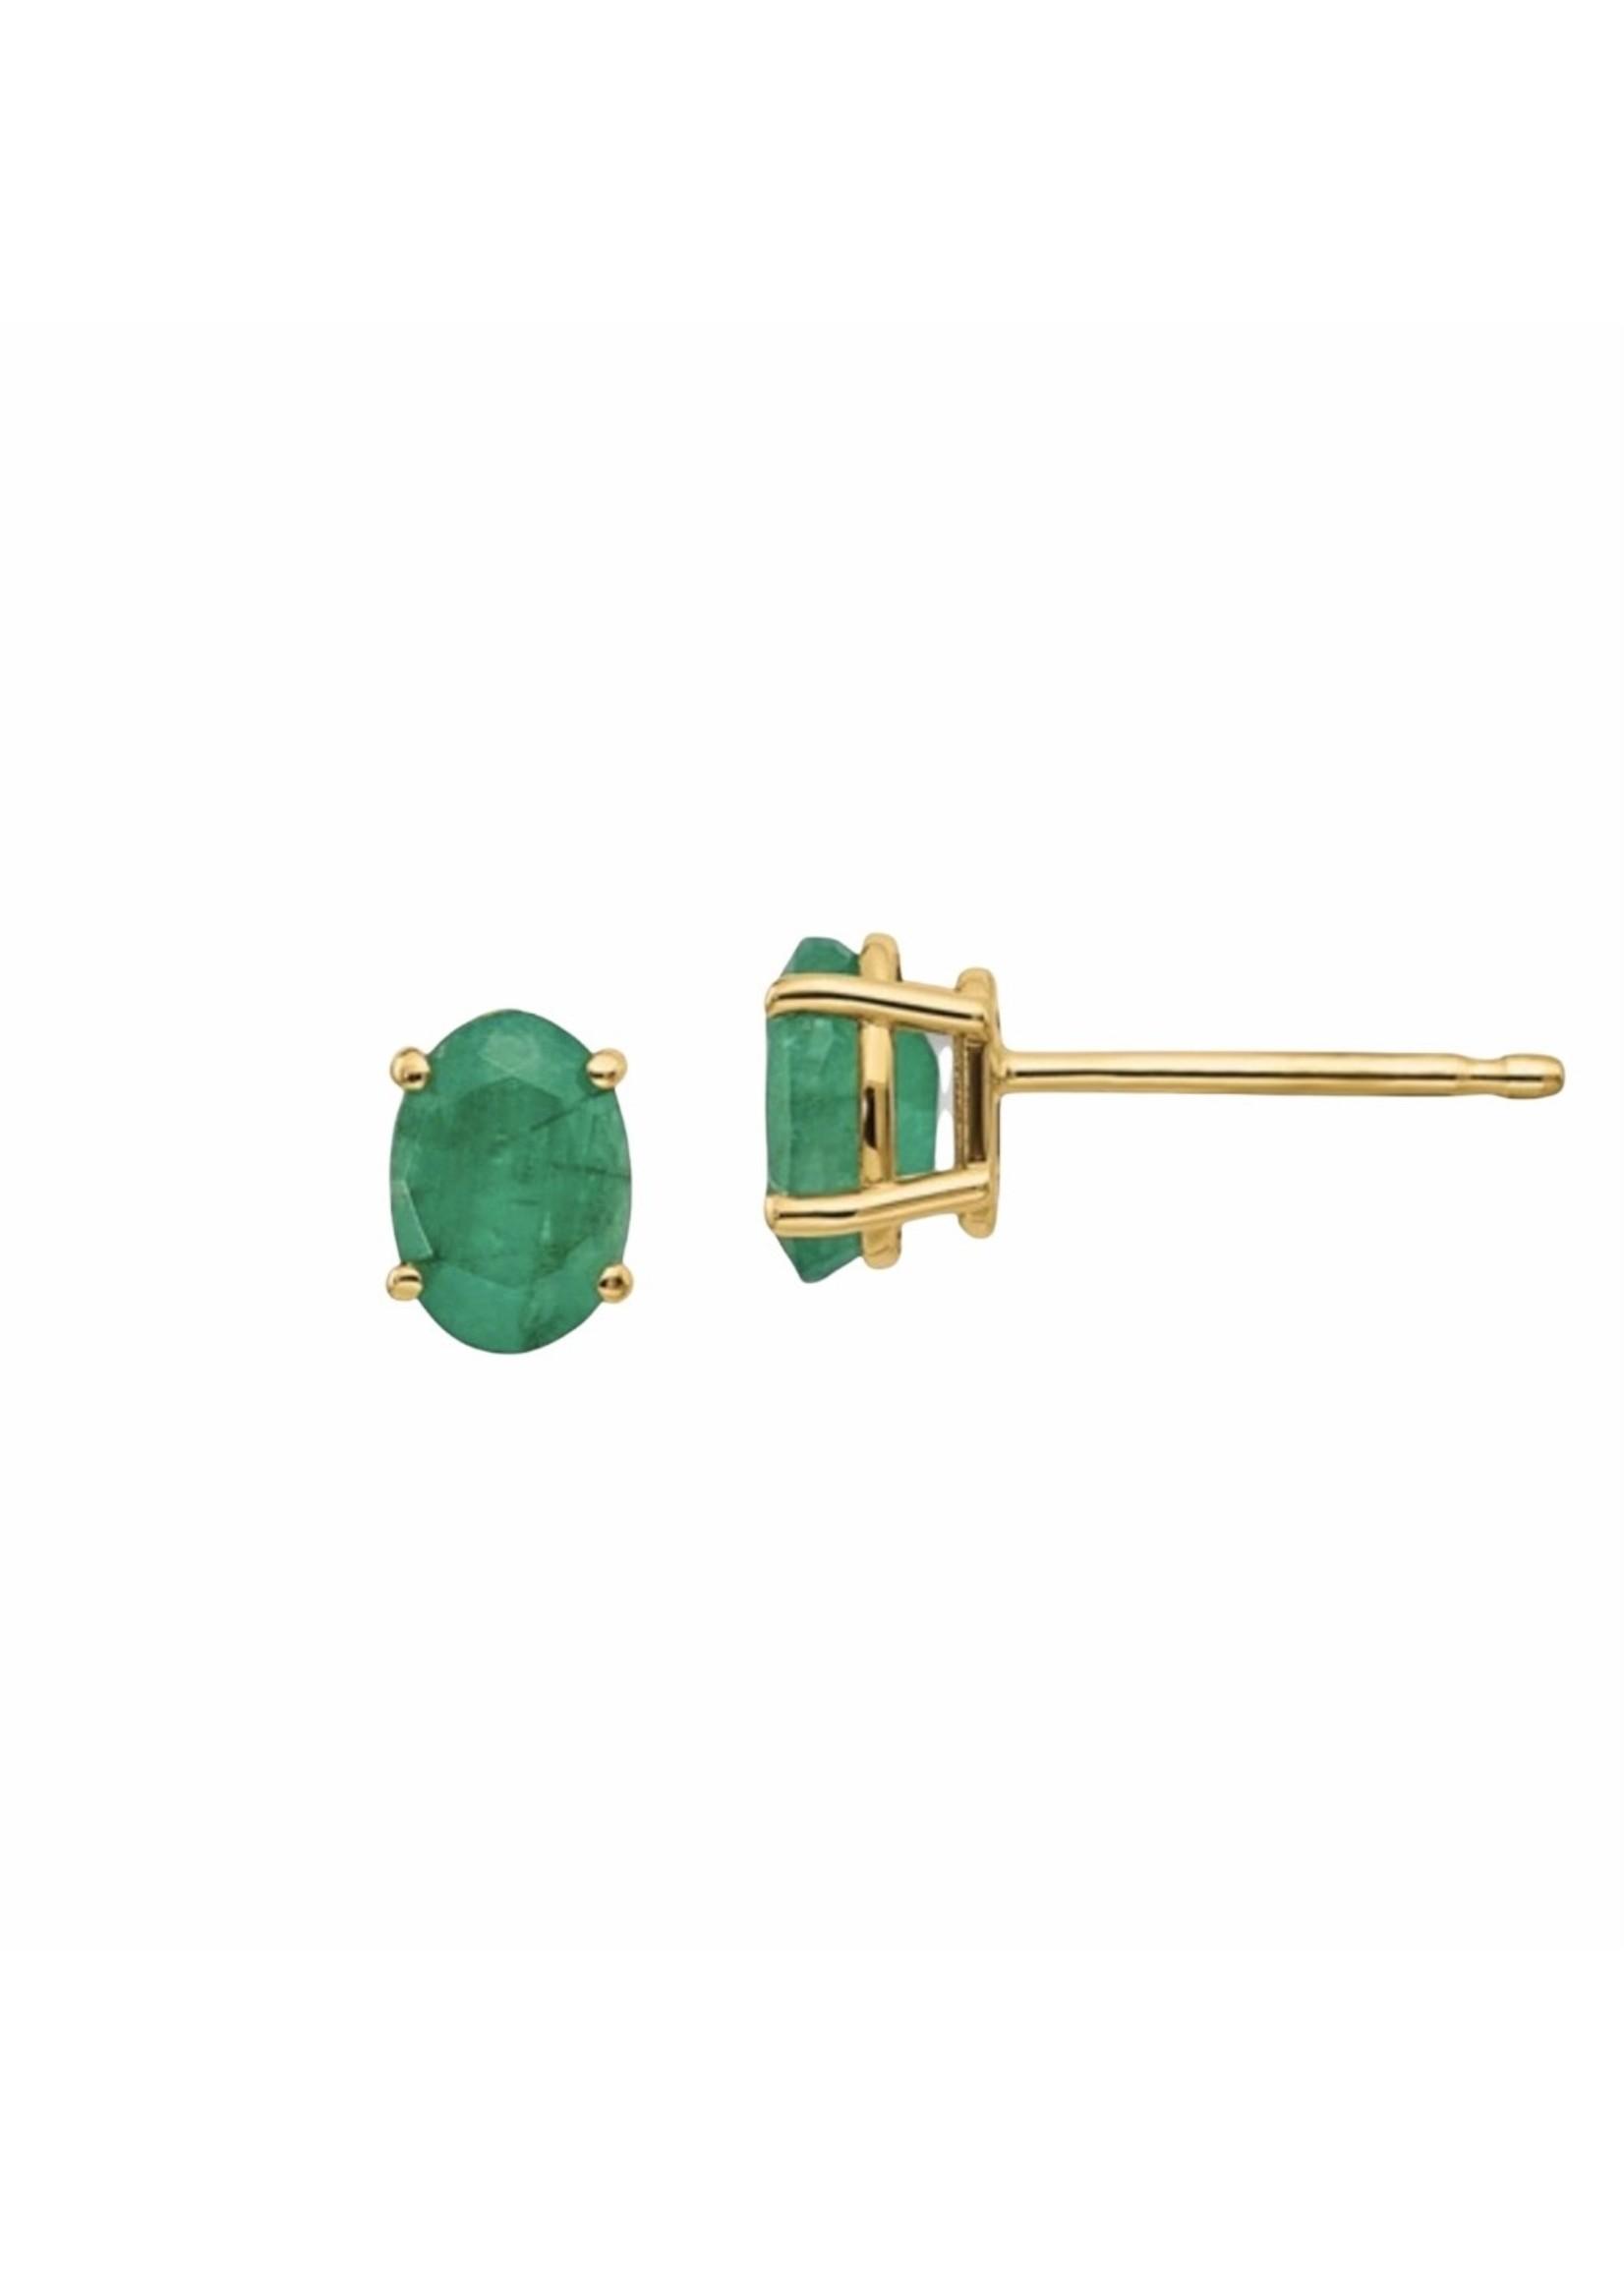 Jill Alberts Emerald Stud Earrings